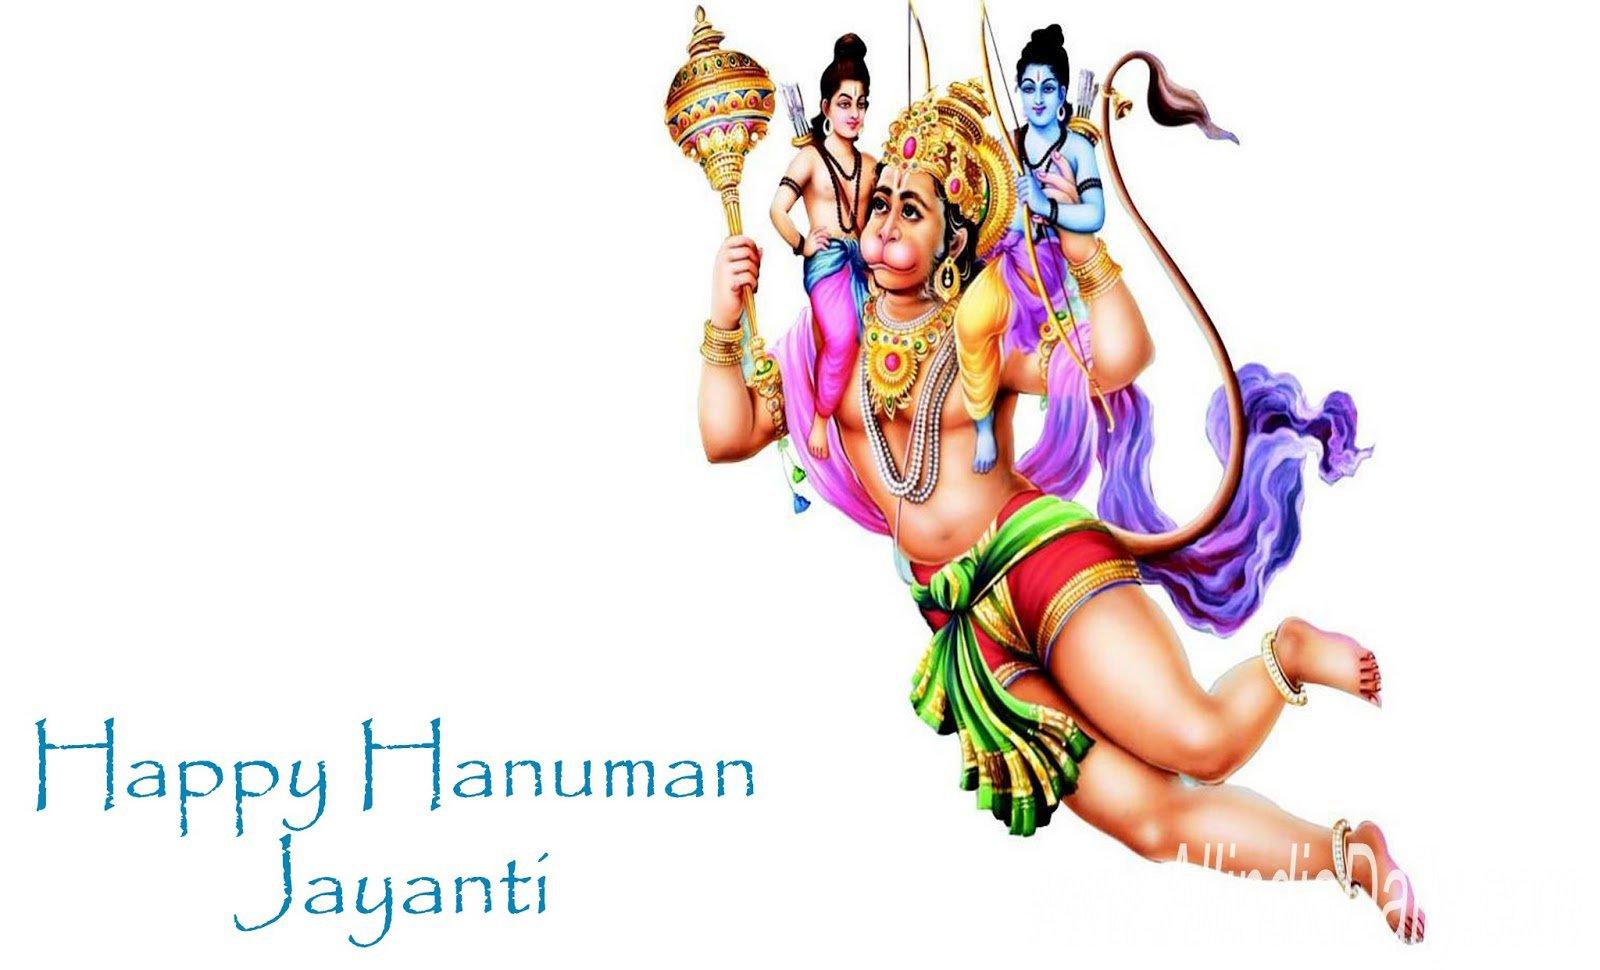 Happy Hanuman Jayanti Tixmotion Tixmotion Jocks